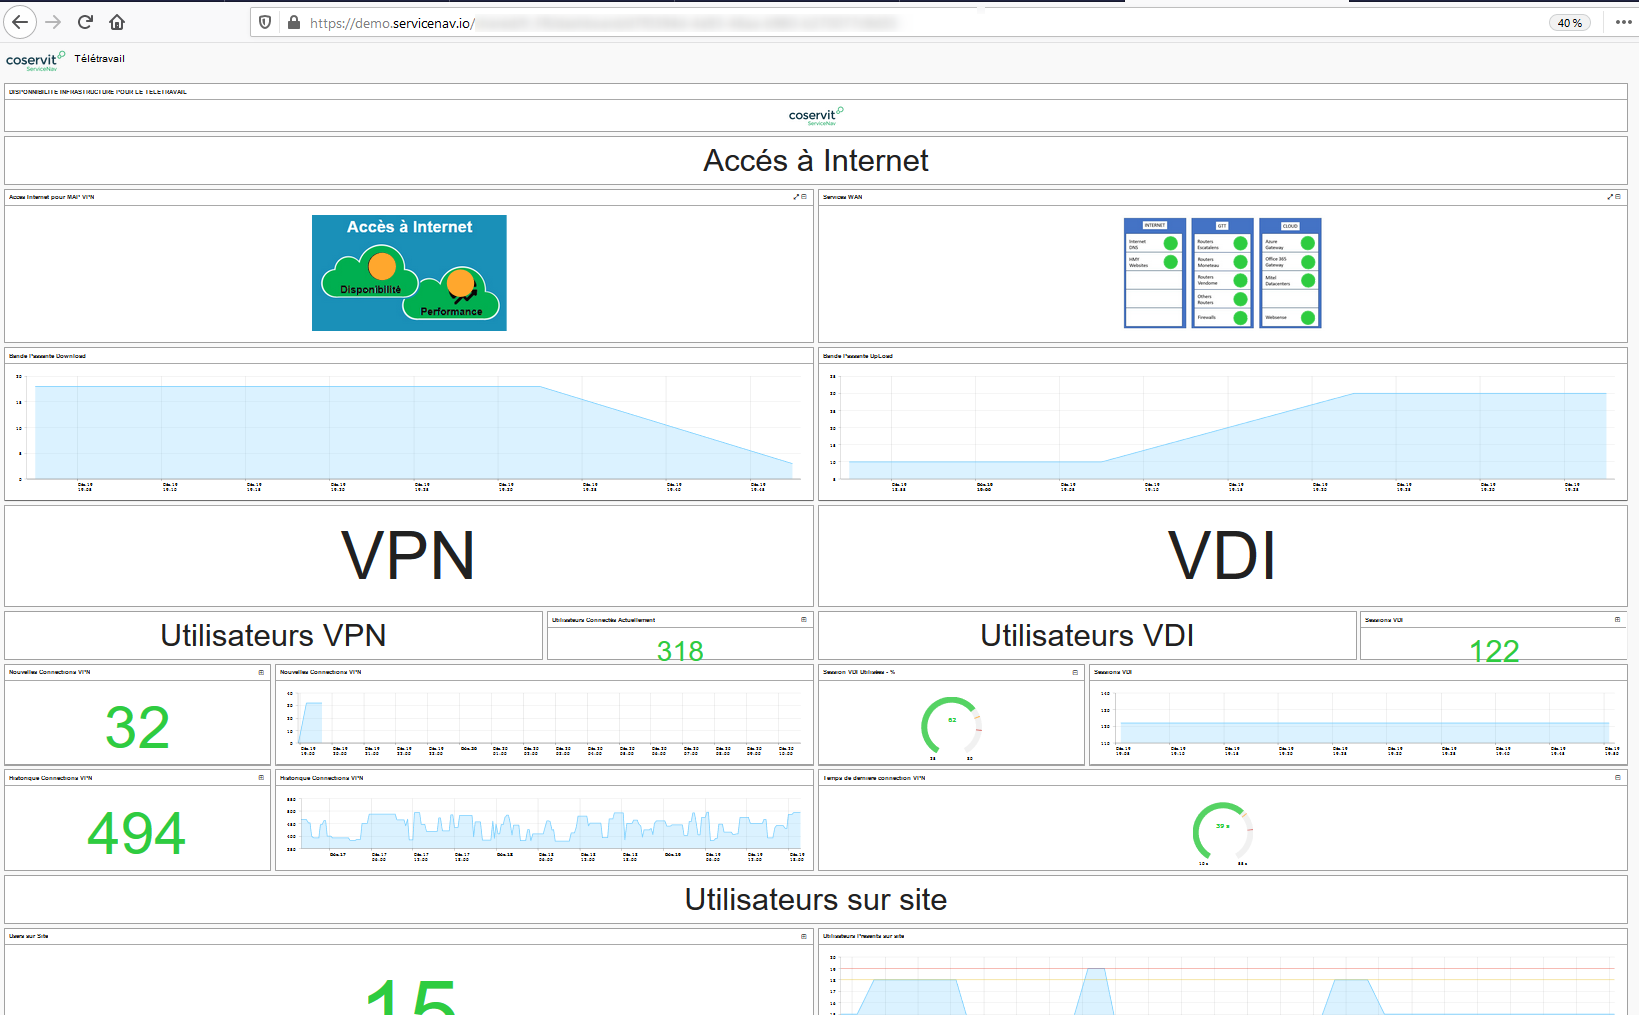 , VPN and VDI monitoring with ServiceNav